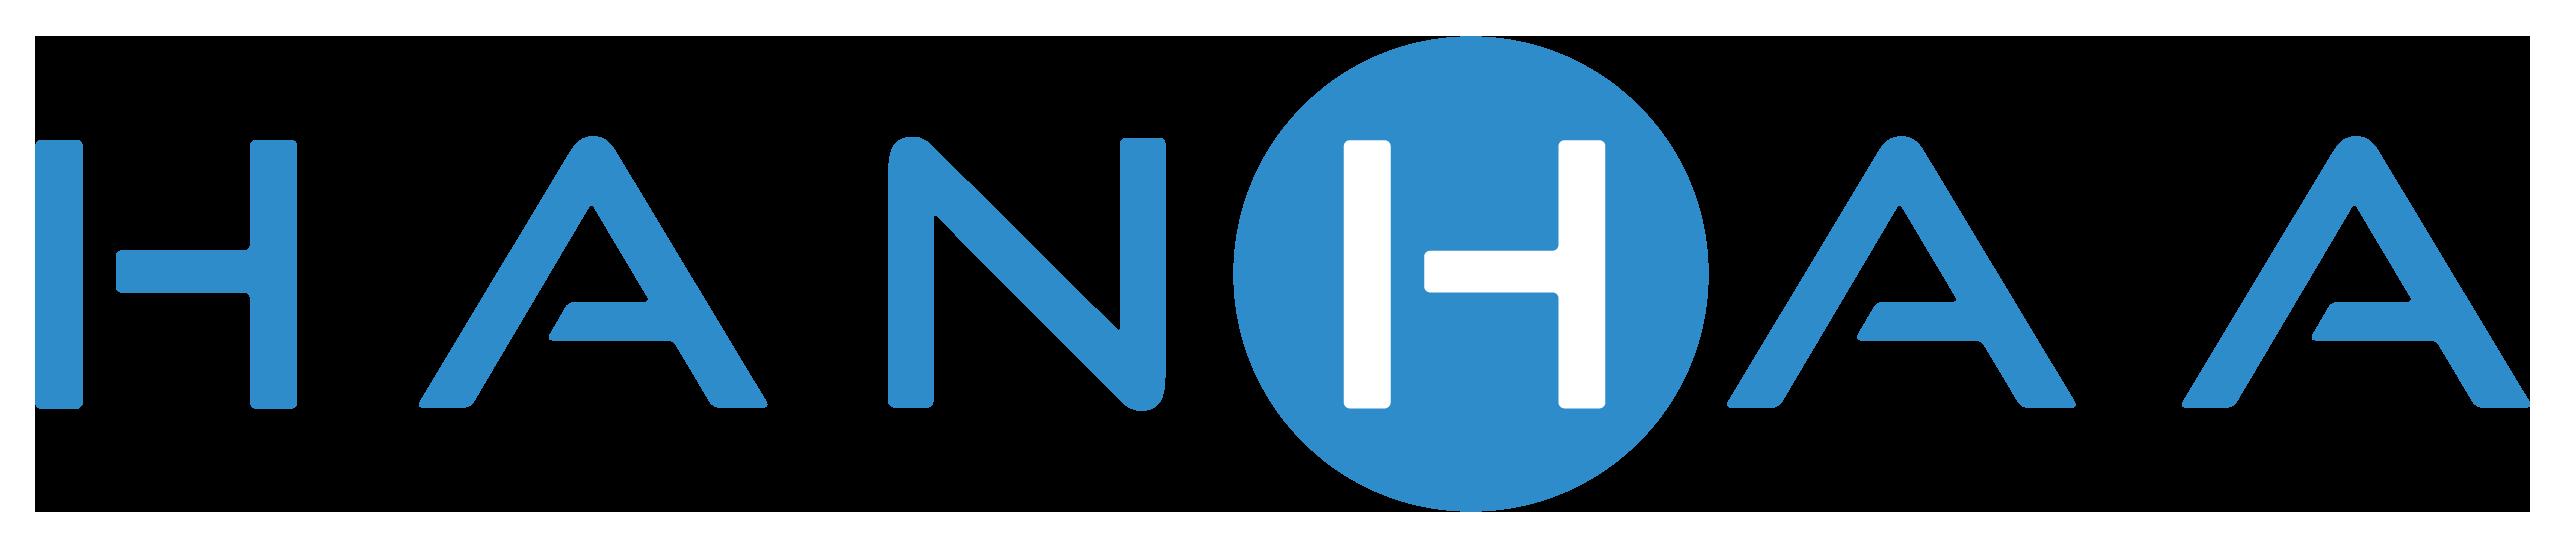 Hanhaa Logo 2017